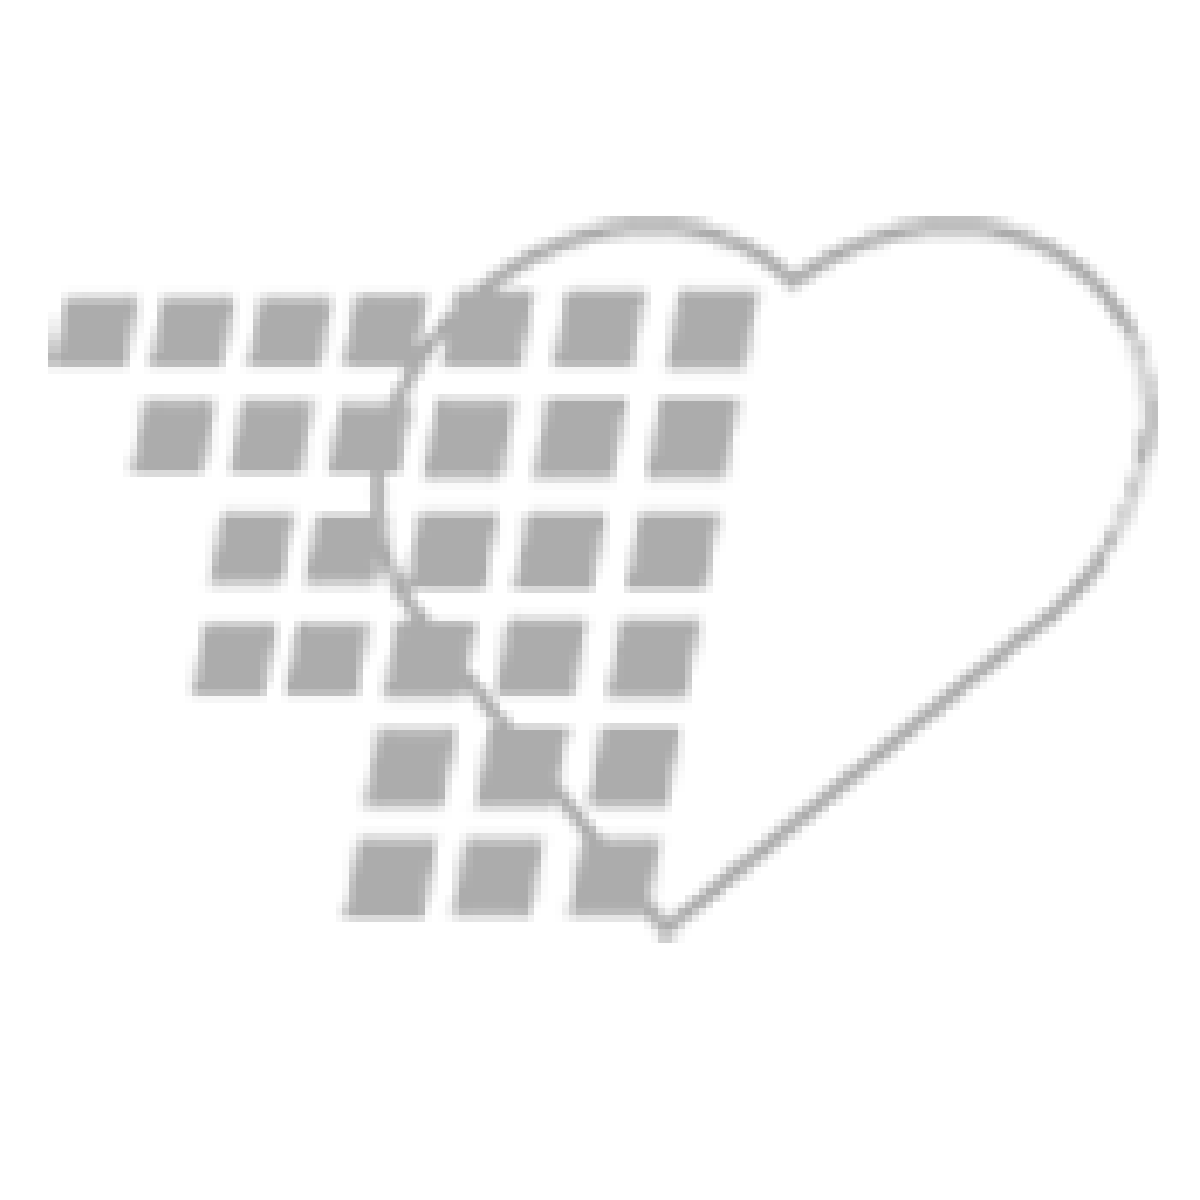 12-81-3652 Laerdal Nursing Baby (SimPad Capable)